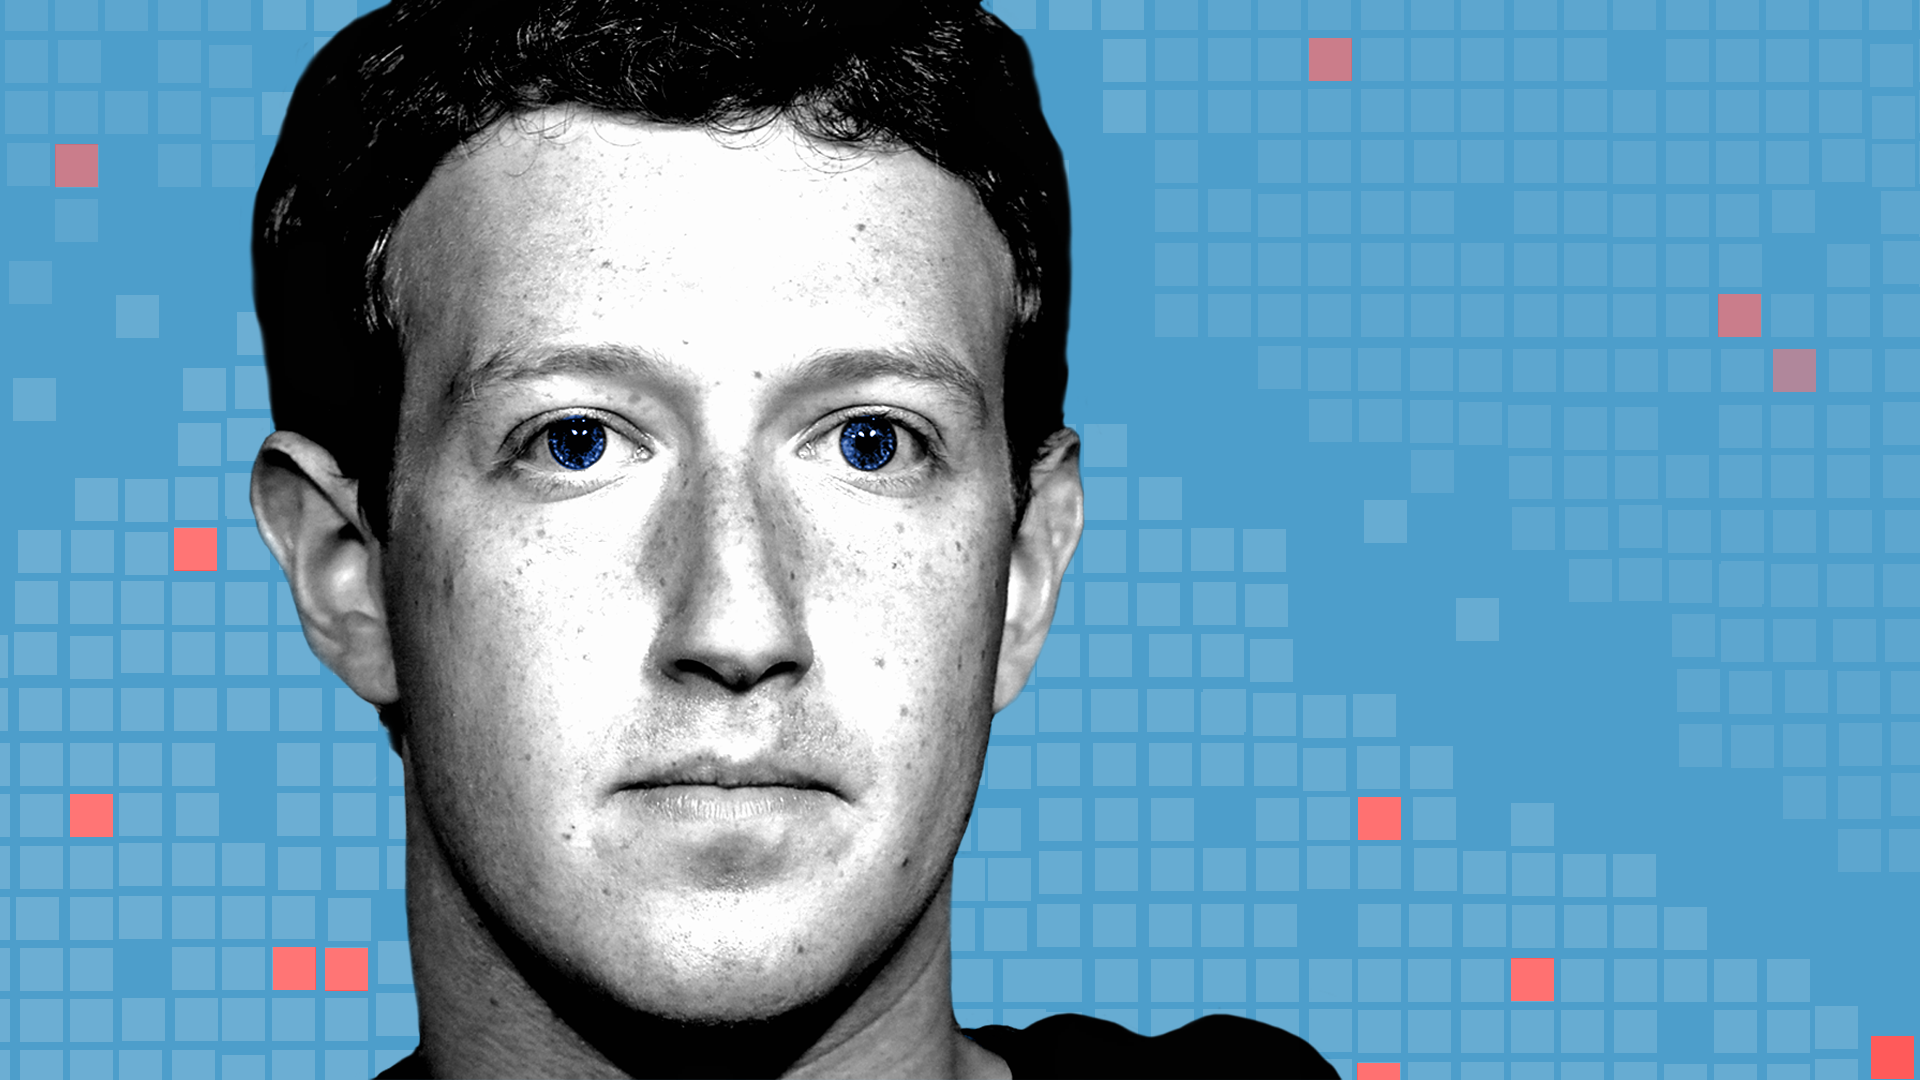 Facebook's executive trainwreck